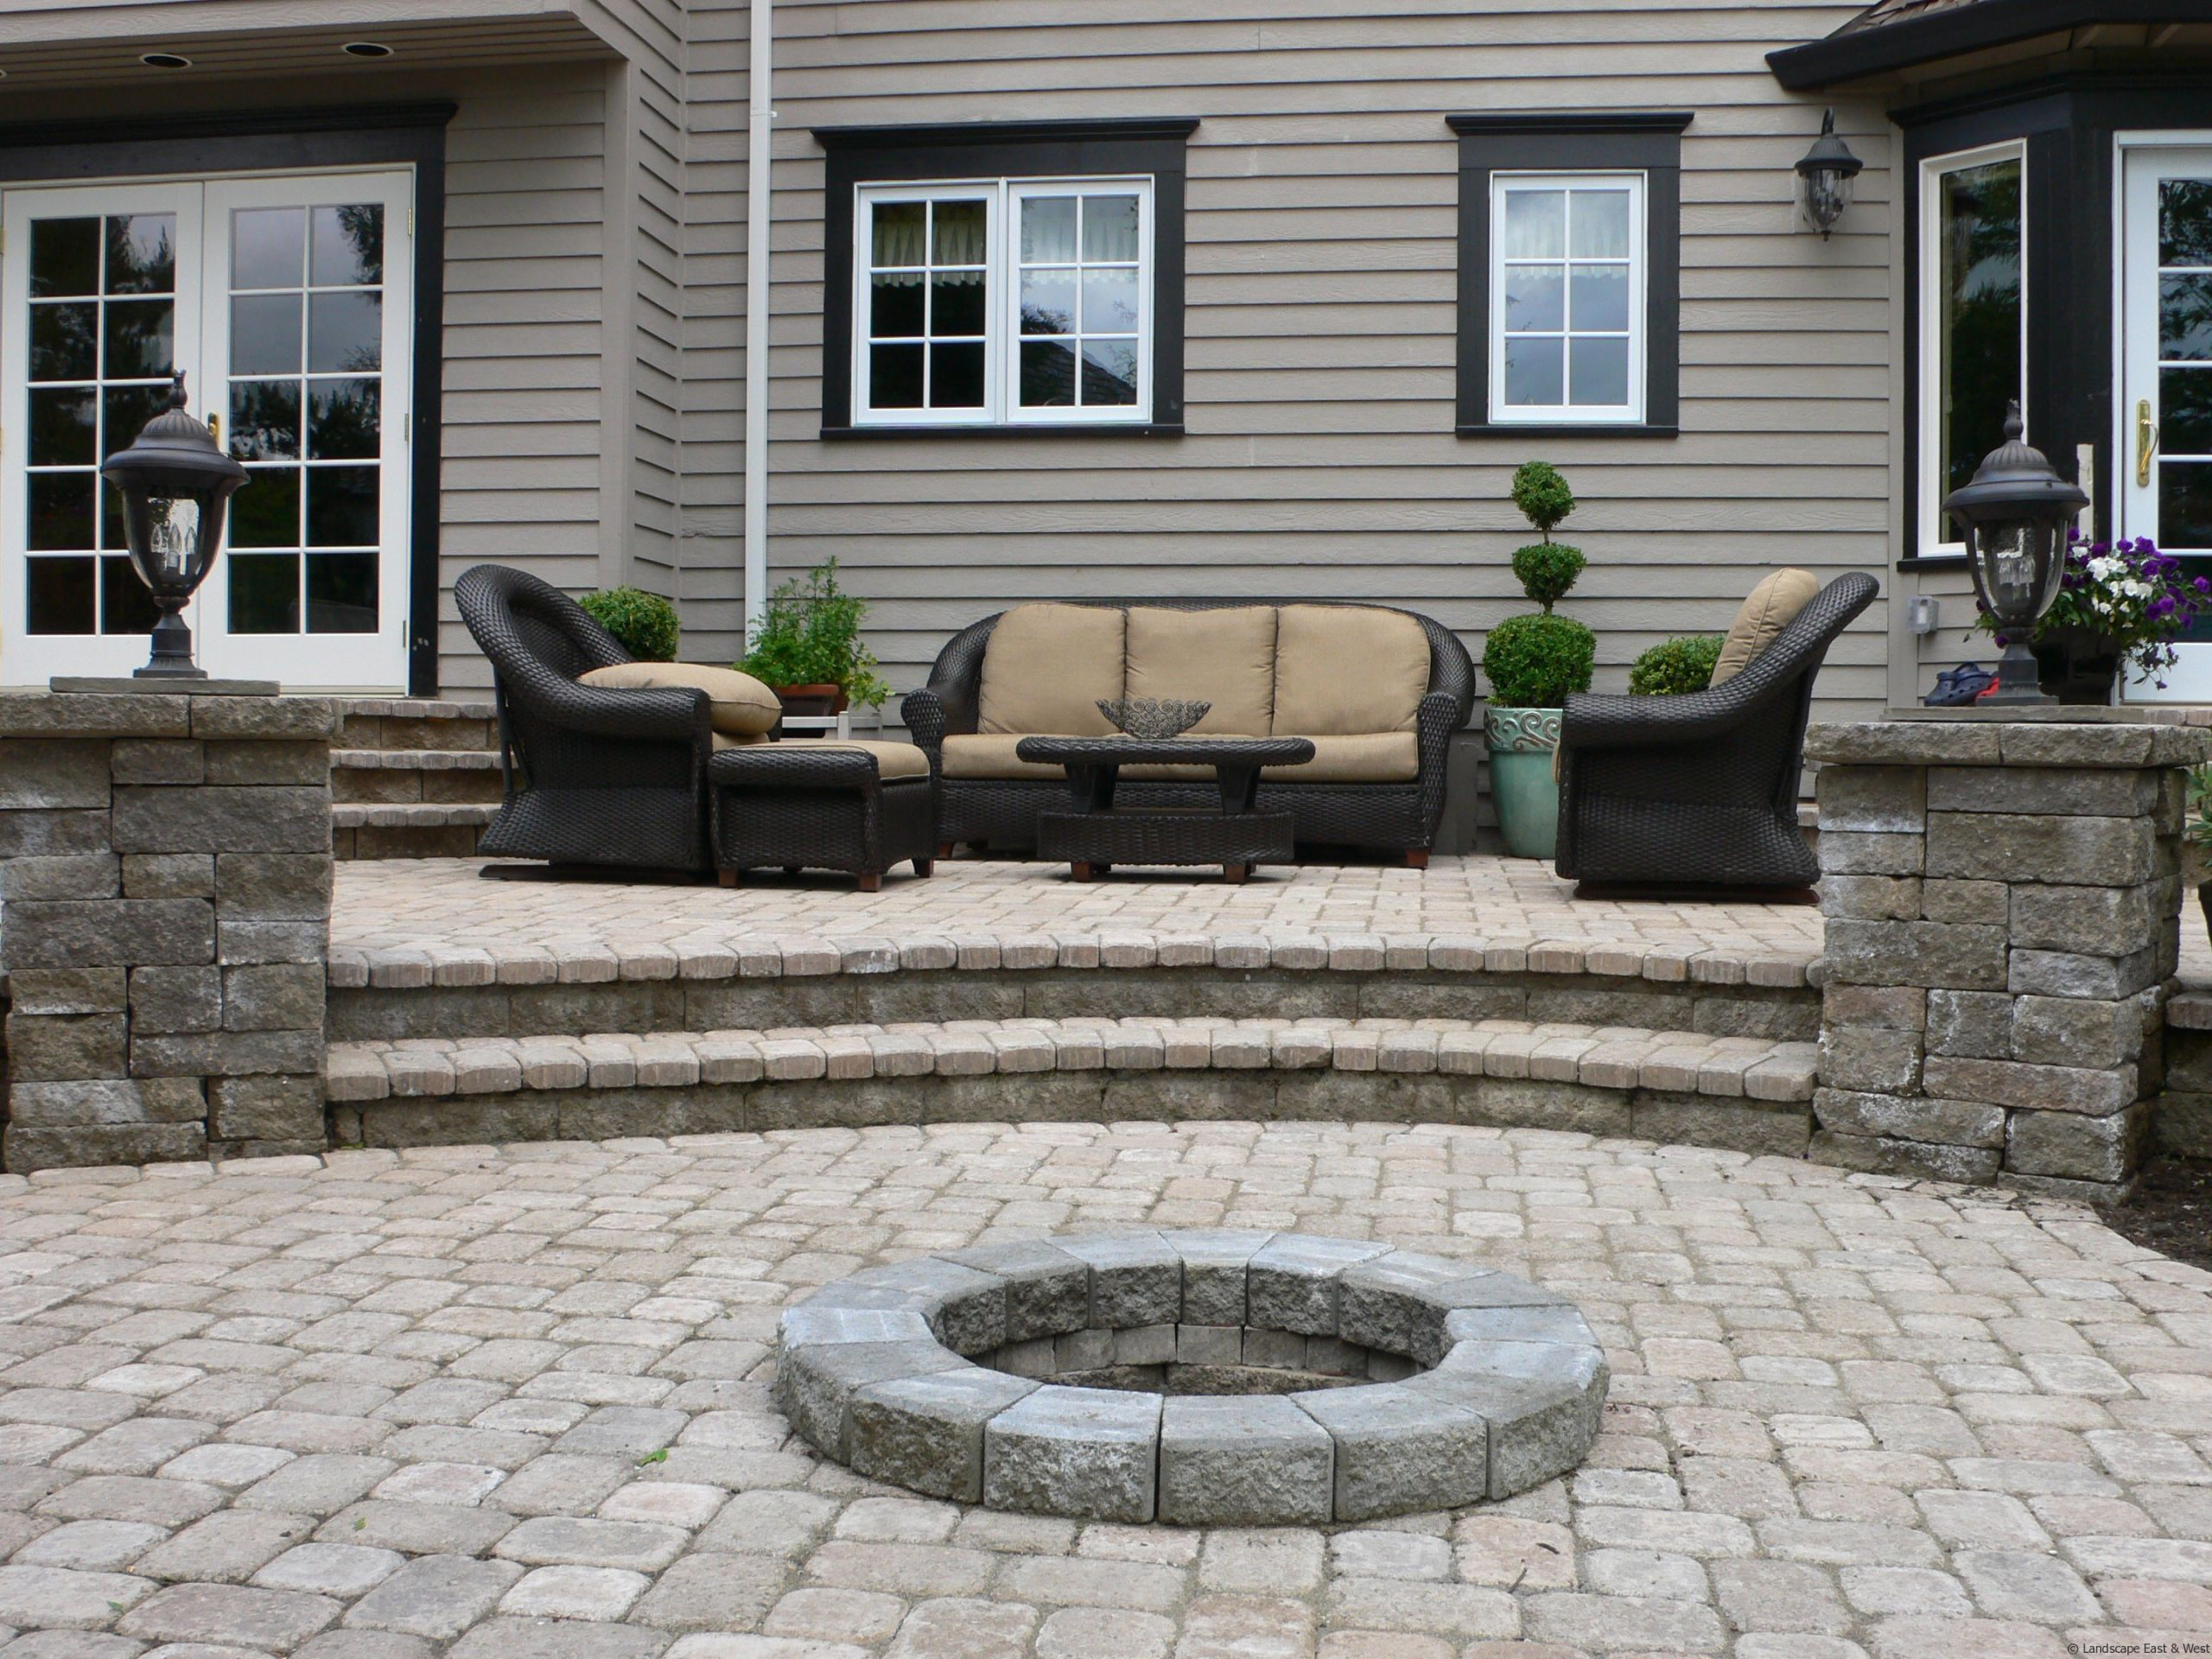 Backyard Patio Paver Design Ideas  5 Ways to Improve Patio Designs for Portland Landscaping